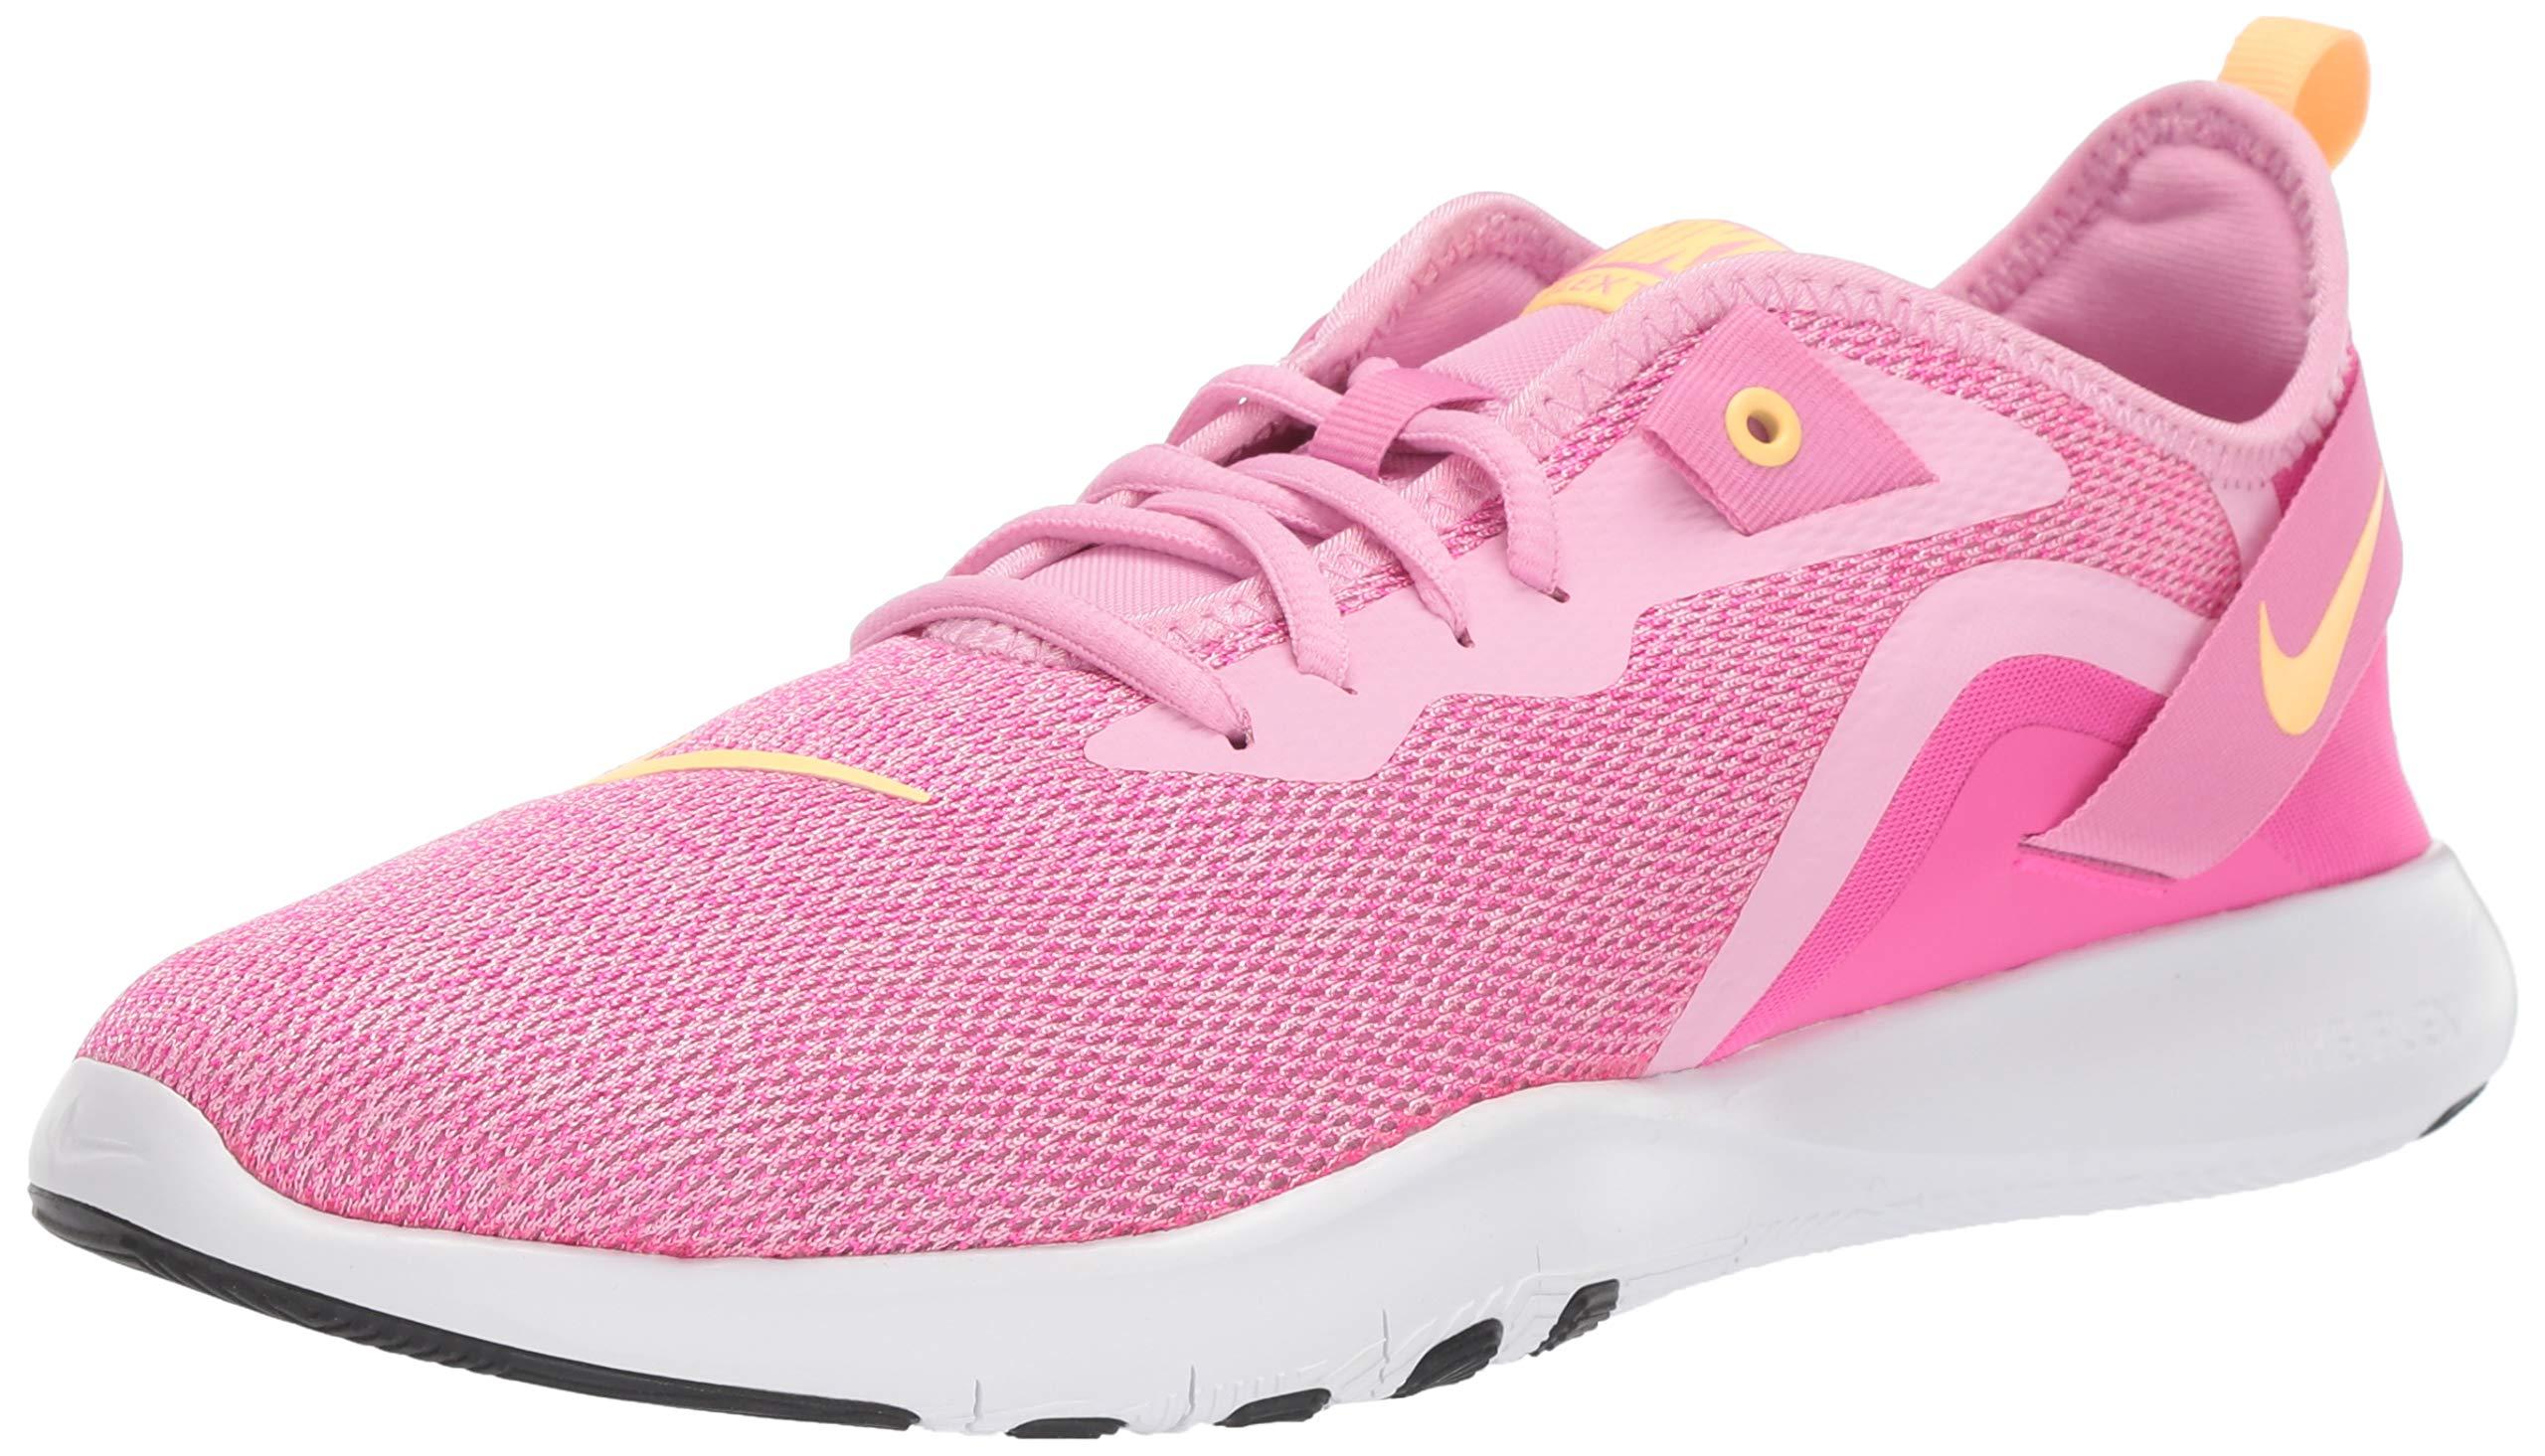 Nike Women's Flex Trainer 9 Sneaker, Pink Rise/Melon Tint - Laser Fuchsia, 12 Regular US by Nike